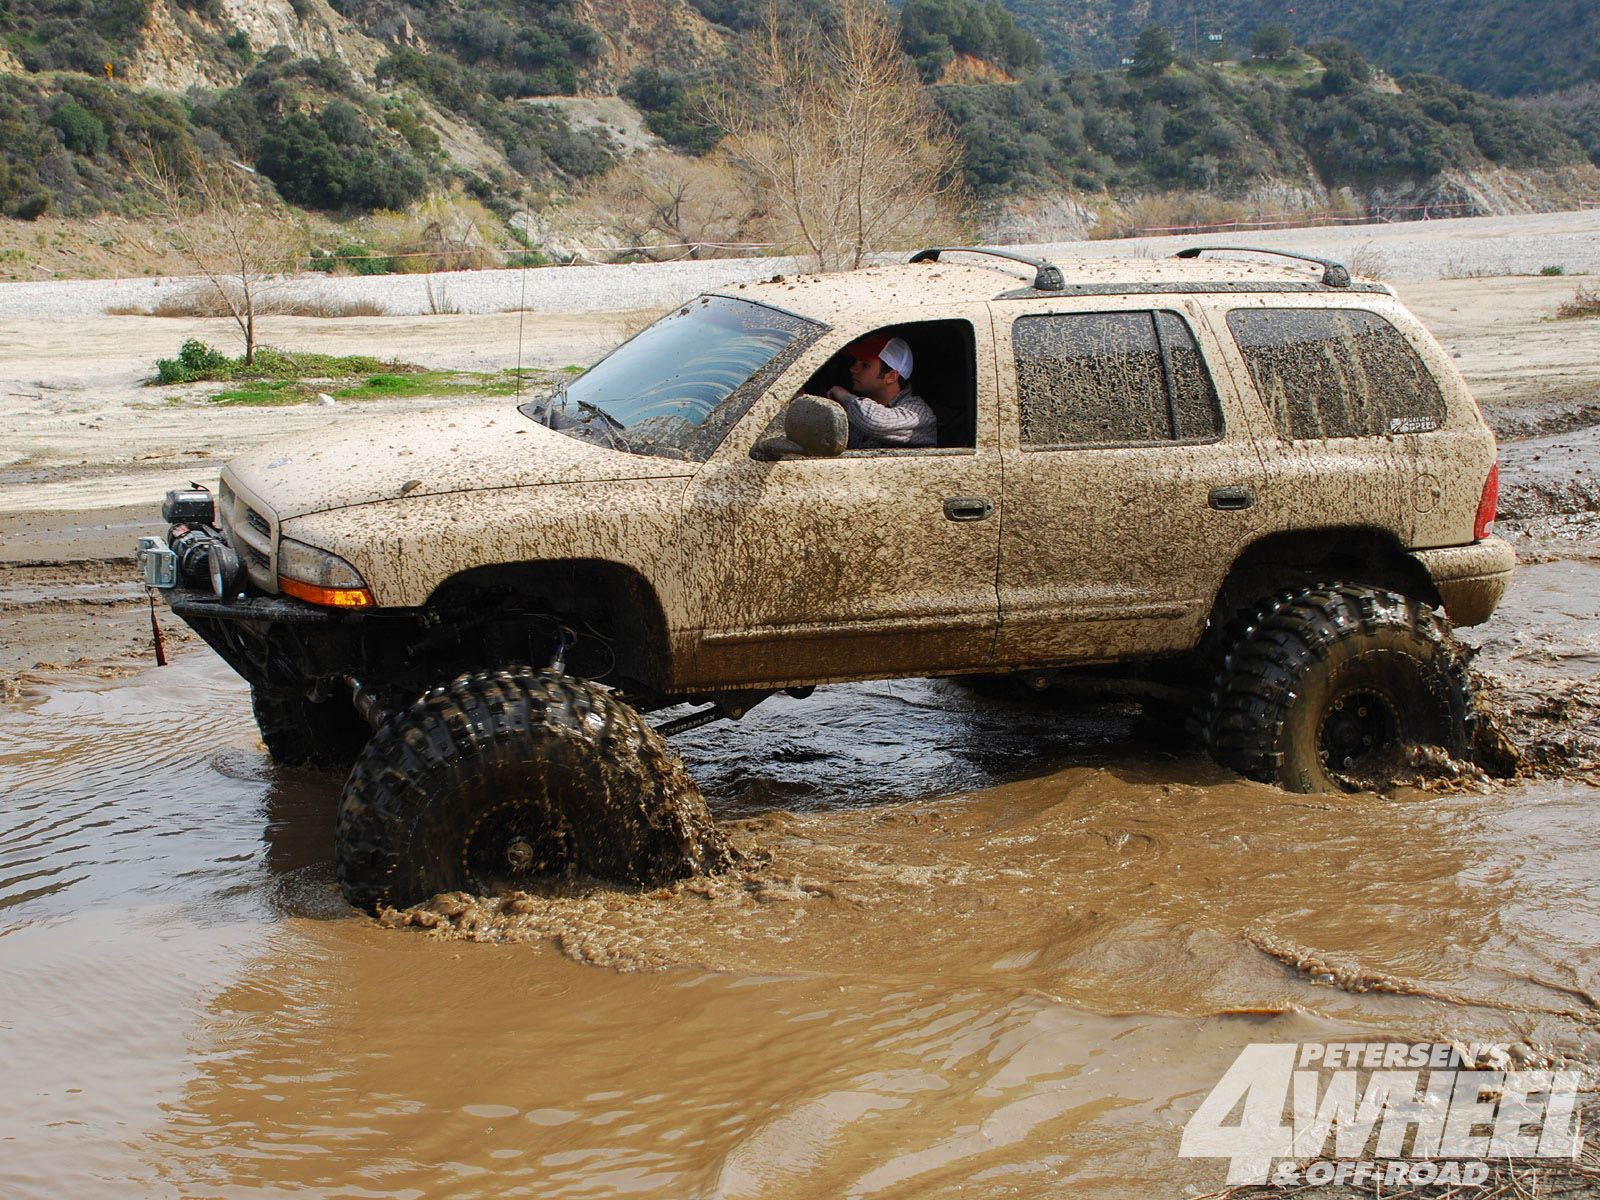 1999_dodge_durango_muddingwater_plunge mudding lifted dodge ram trucks - Dodge Ram 1500 Lifted Mudding